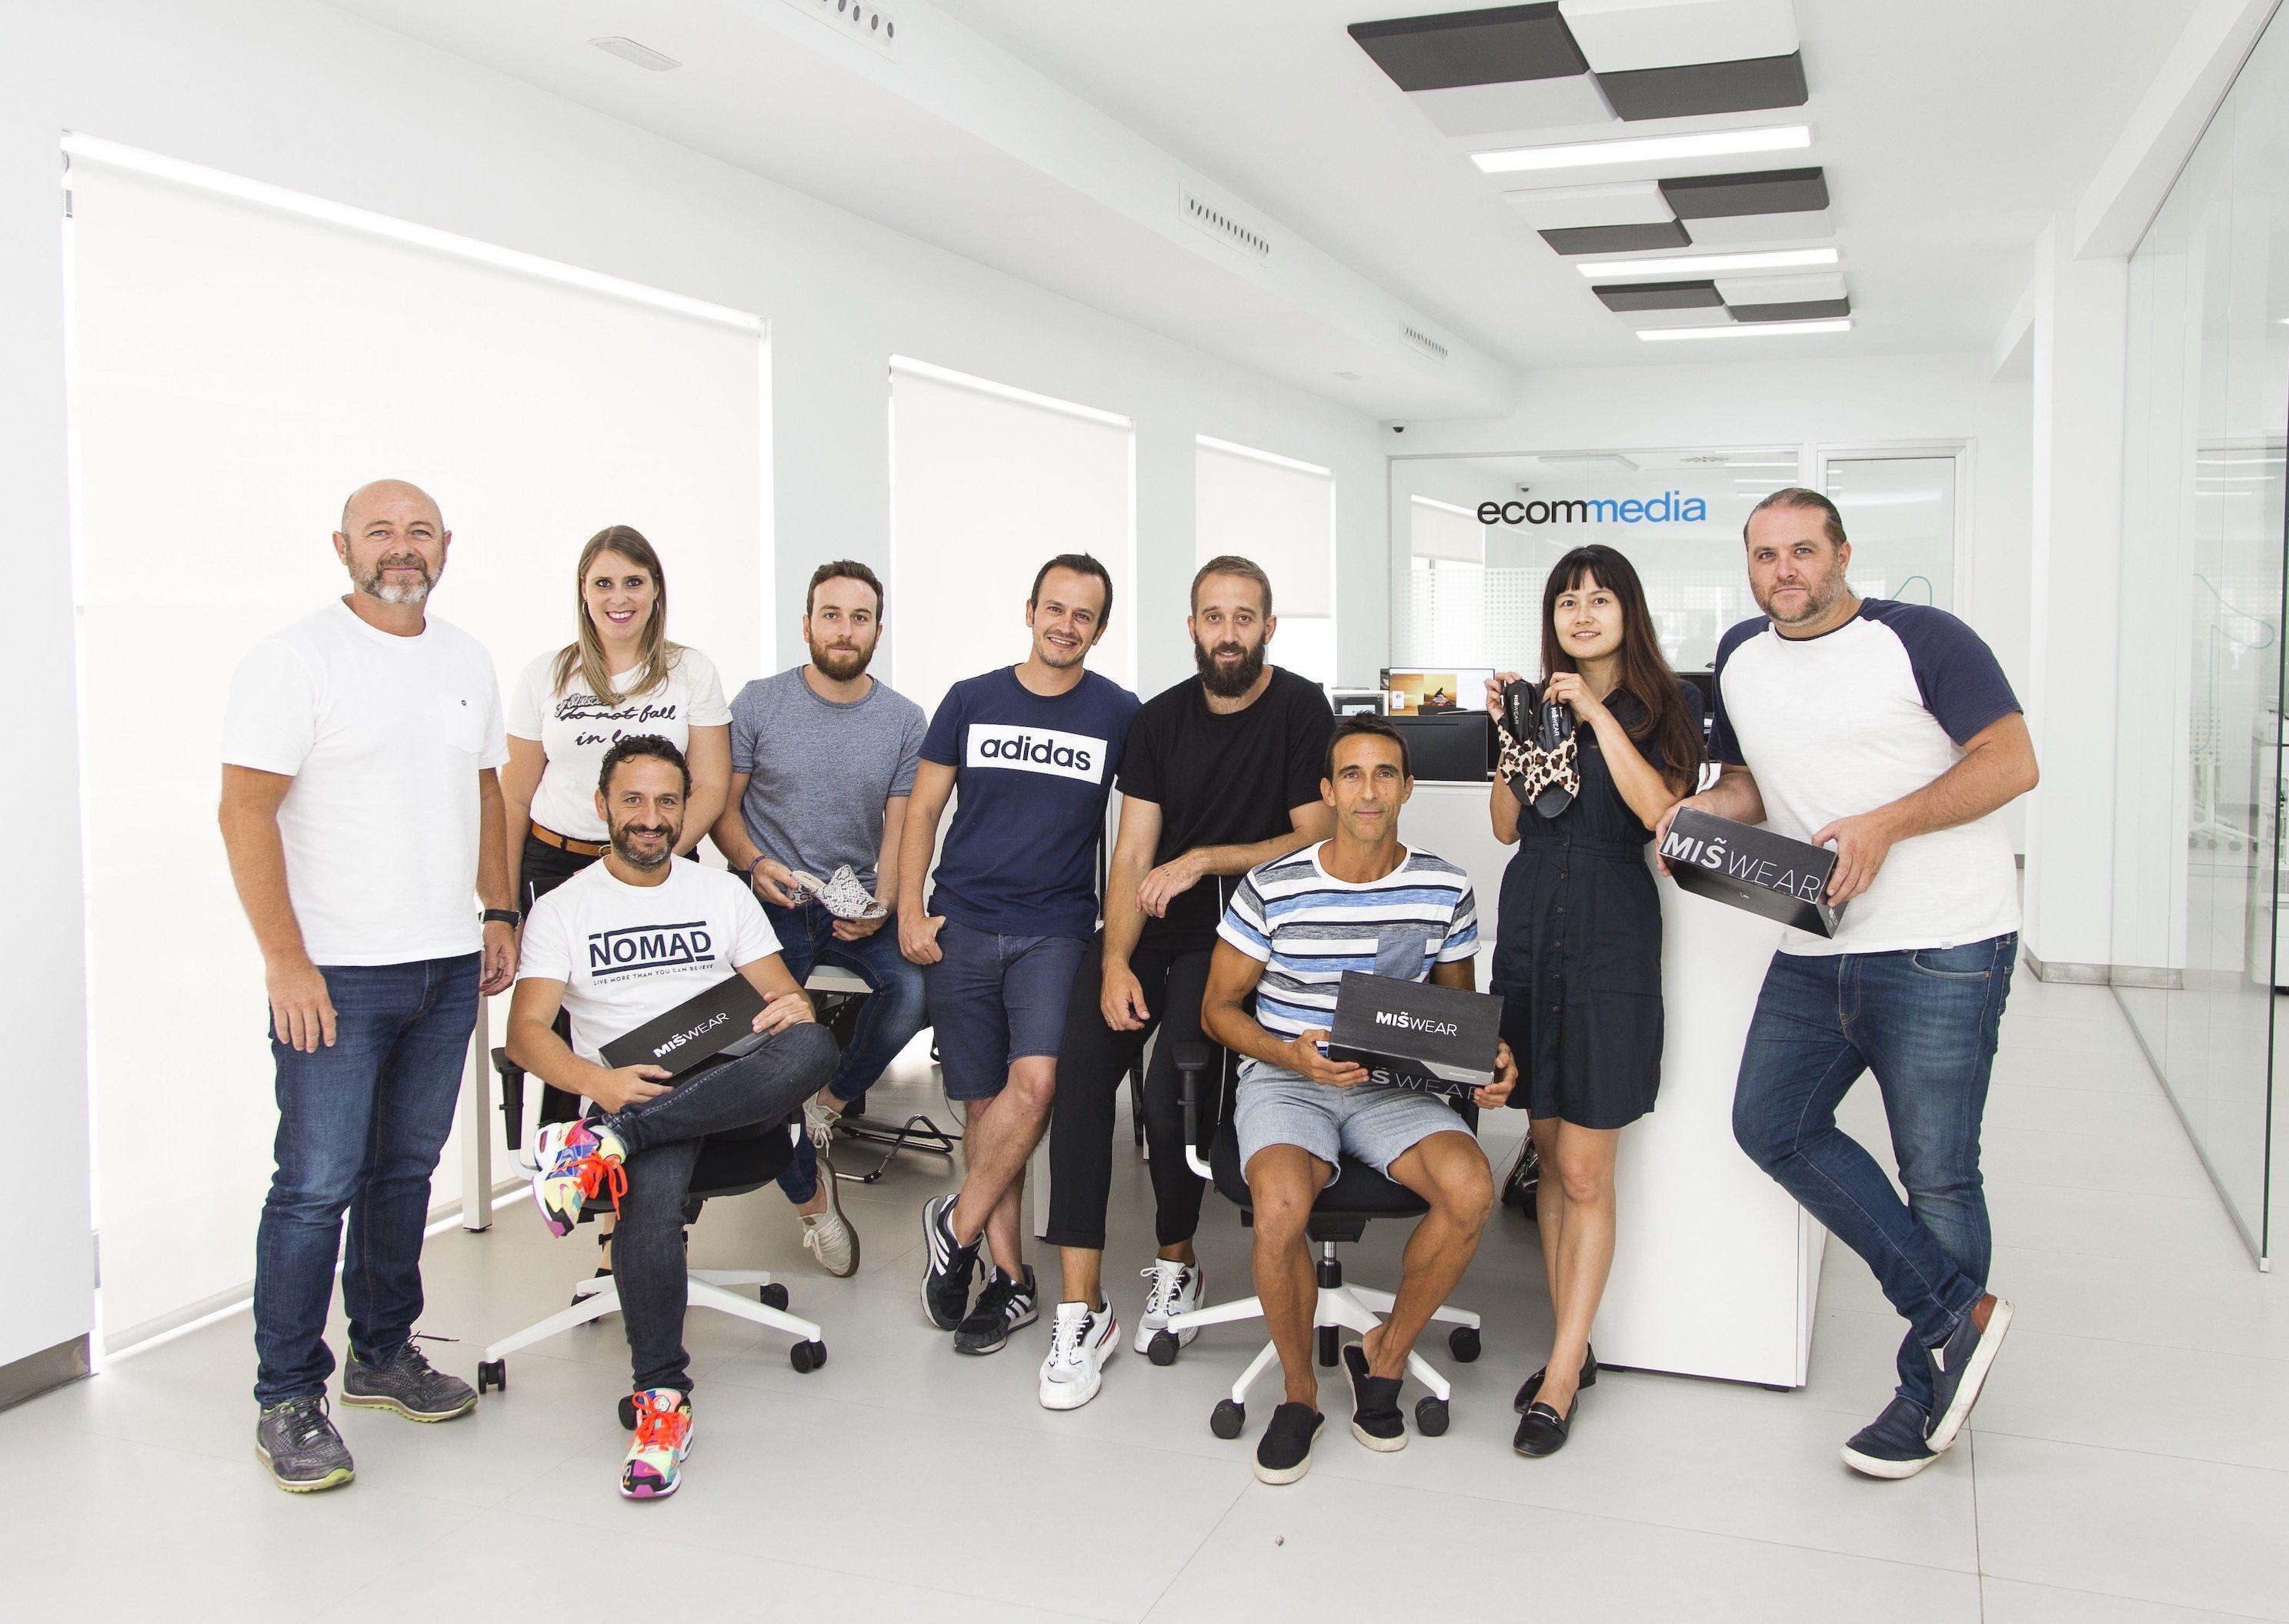 MISWEAR una plataforma eCommerce 'Made in Spain' en Asia